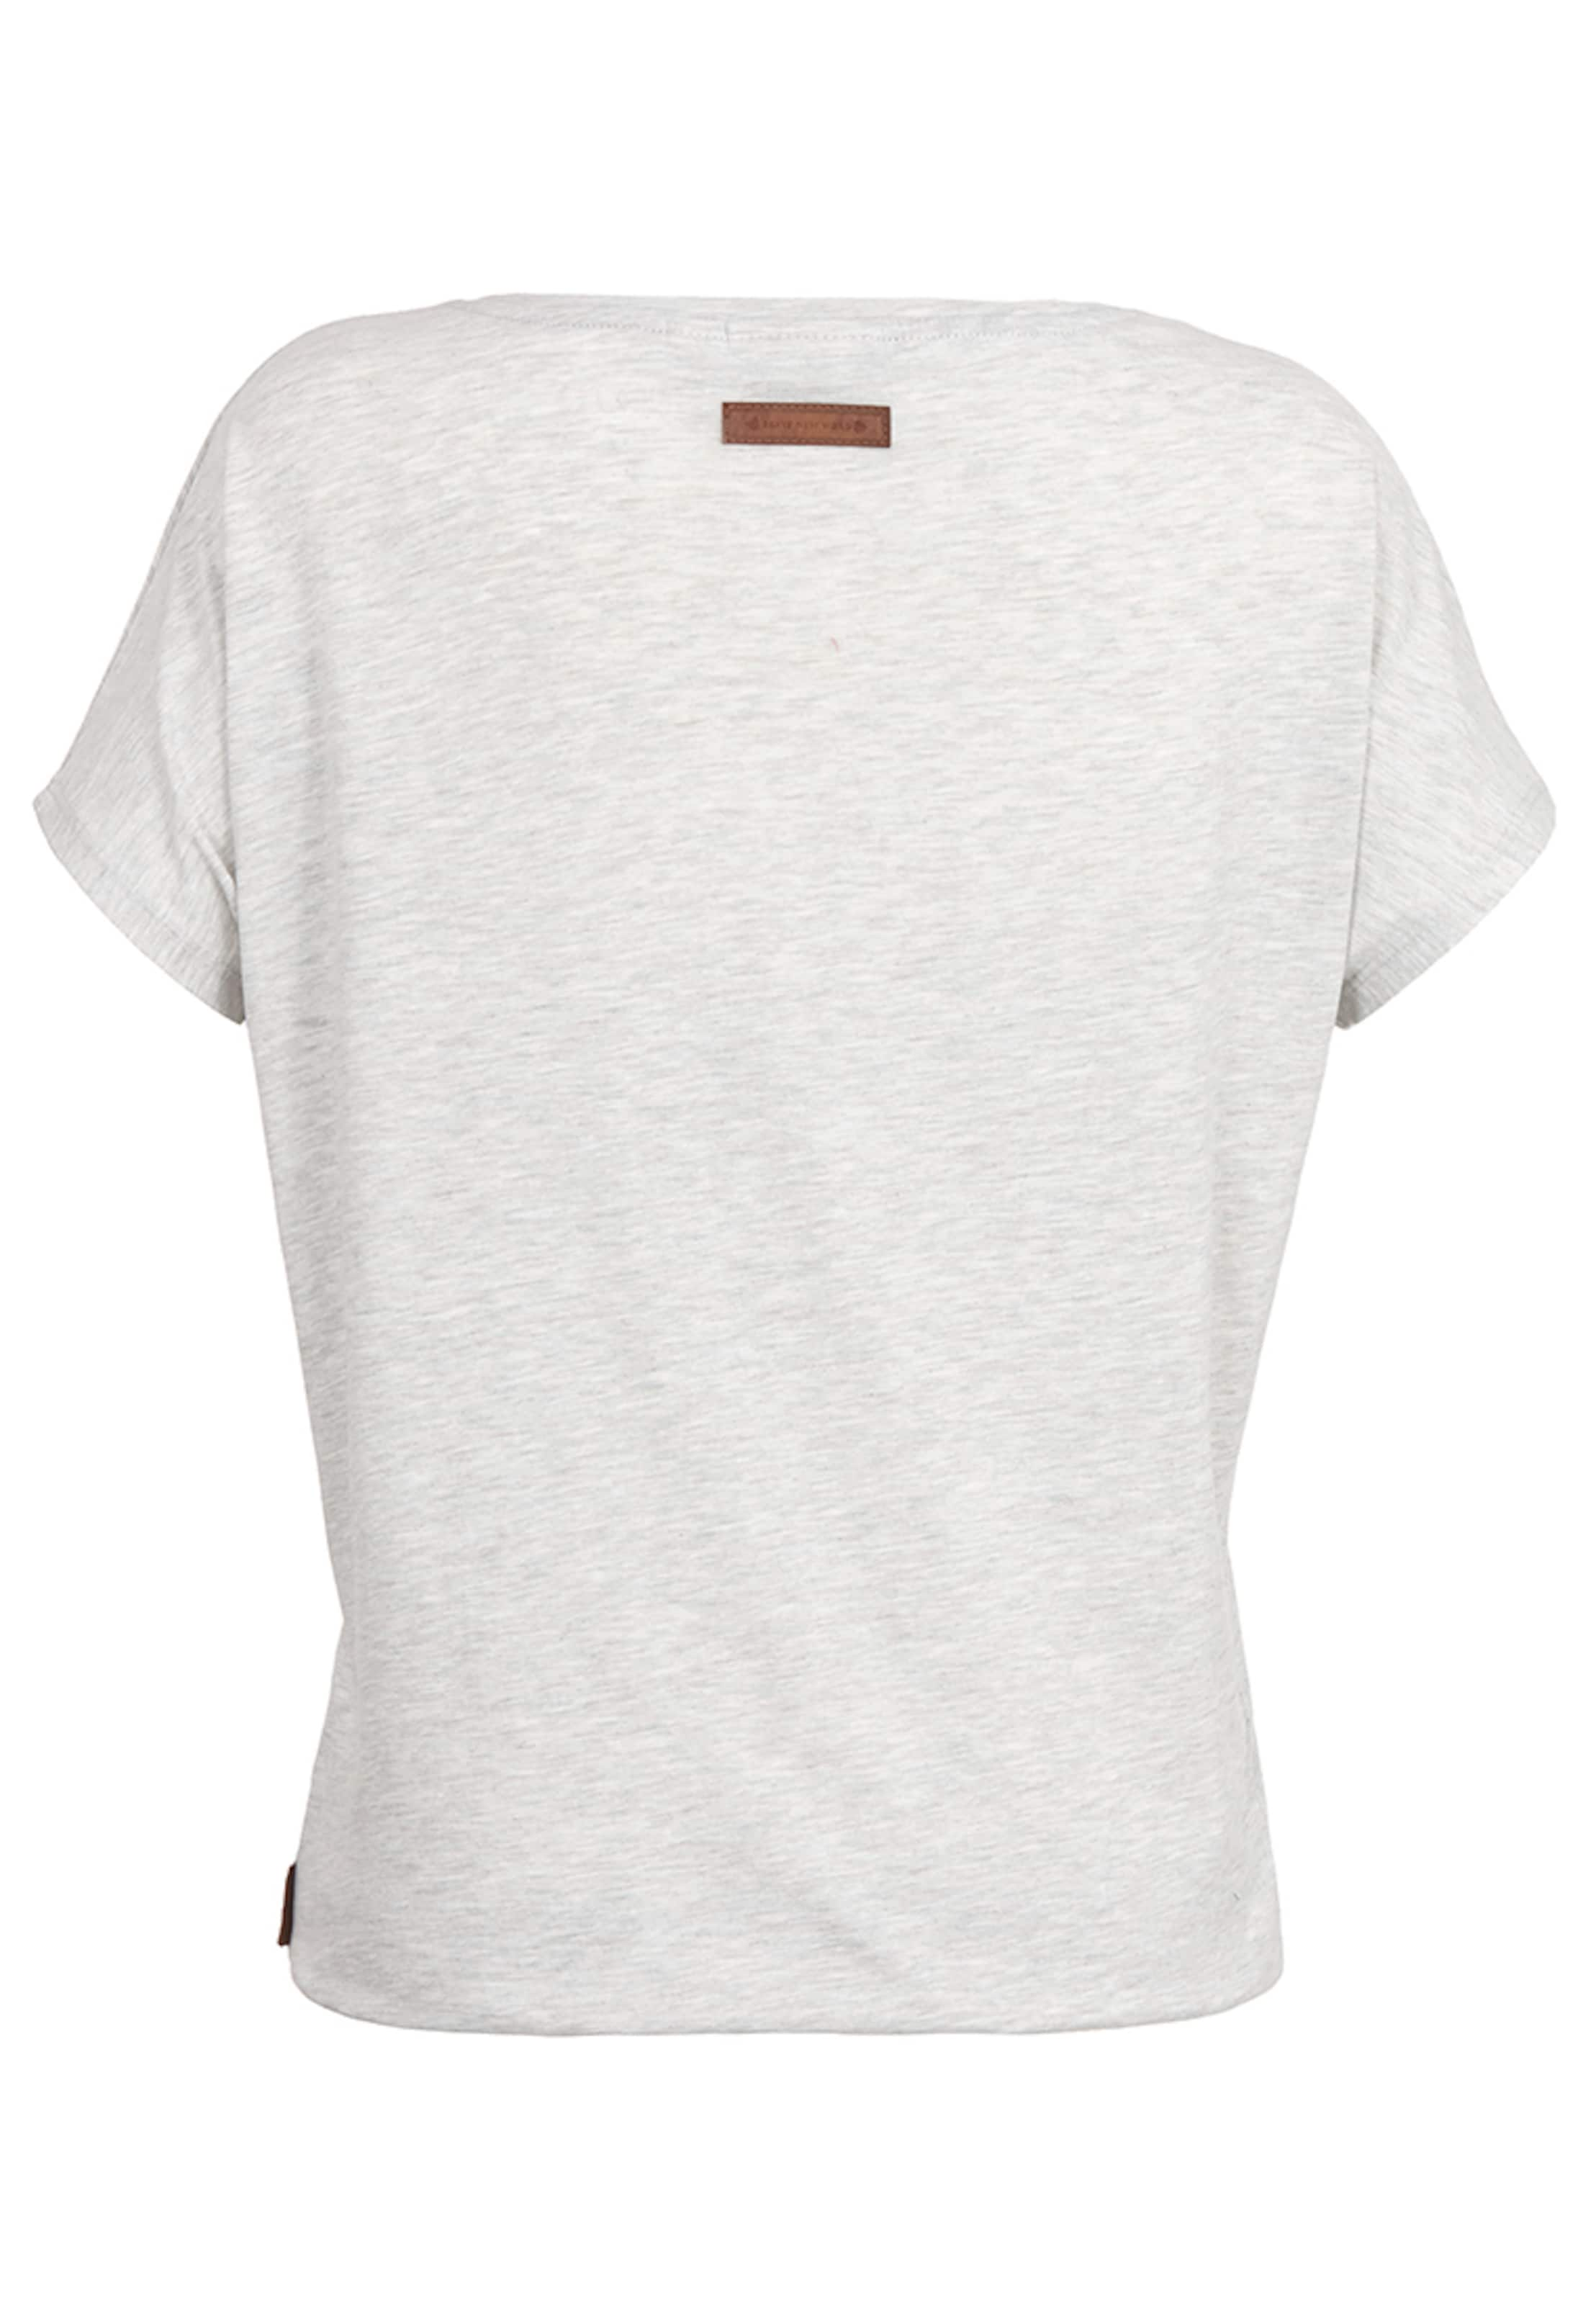 shirt 'schnella Fumé Naketano T Bleu En Baustella' dBrxhtQsC